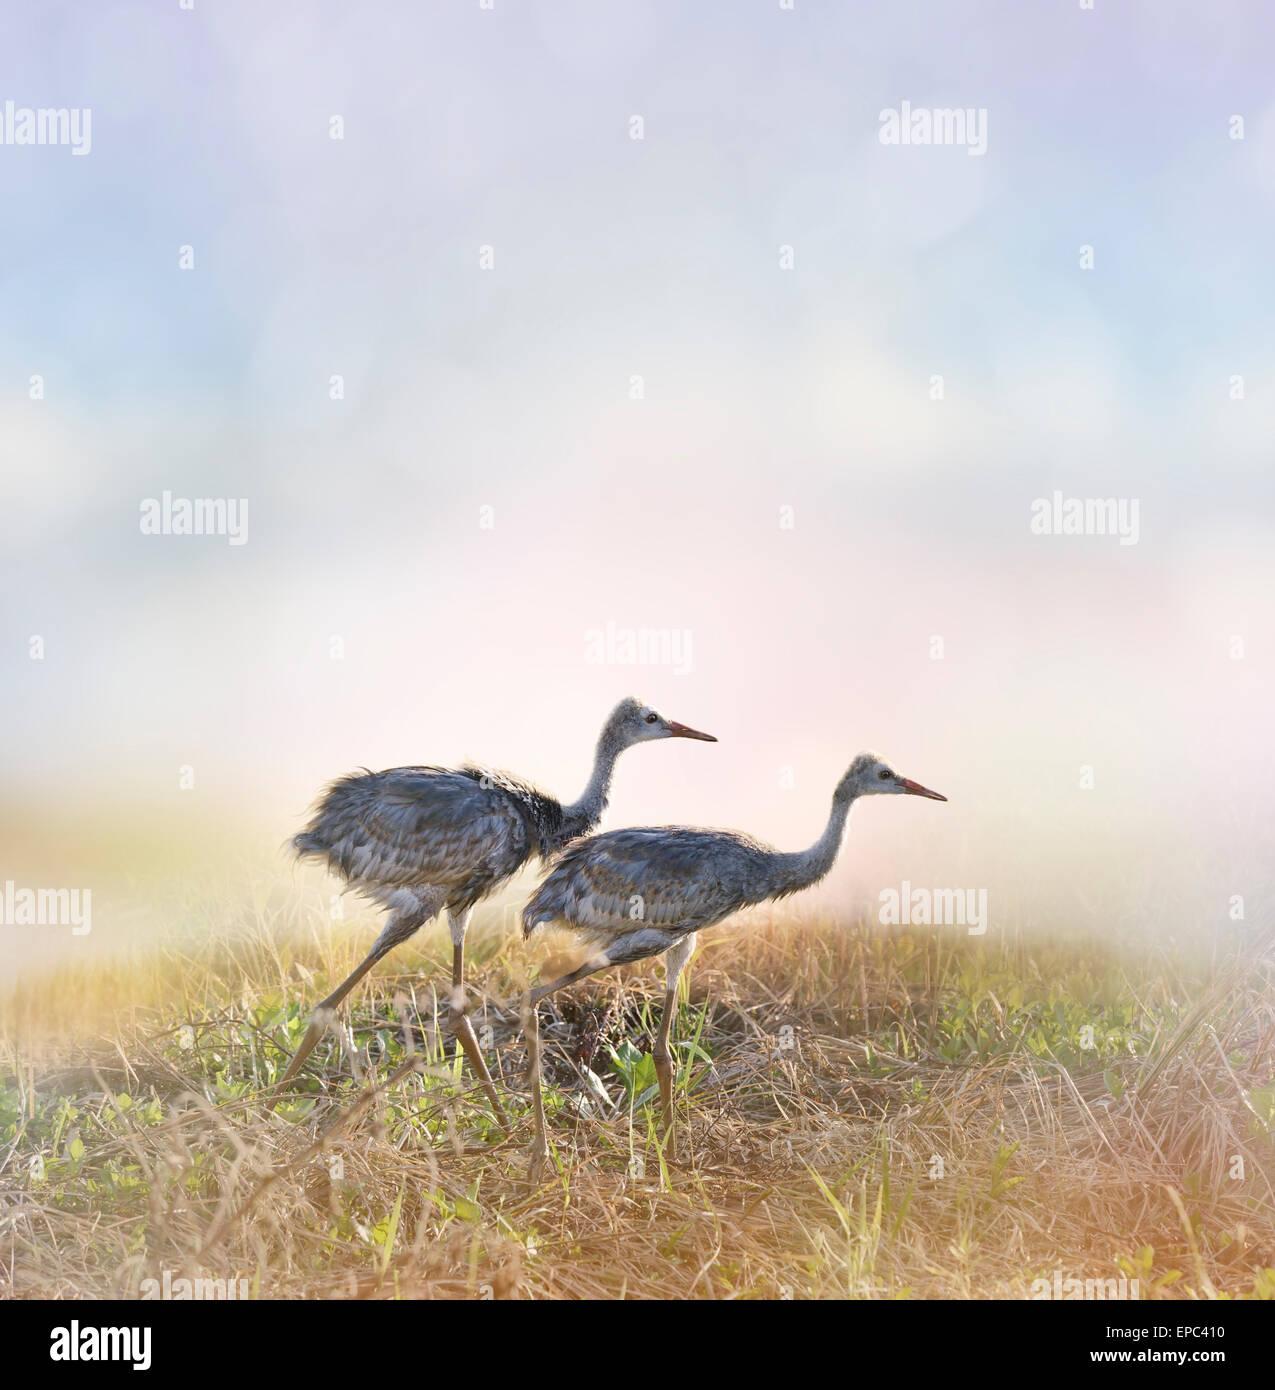 Sandhill Crane Chicks Walking At Sunrise - Stock Image